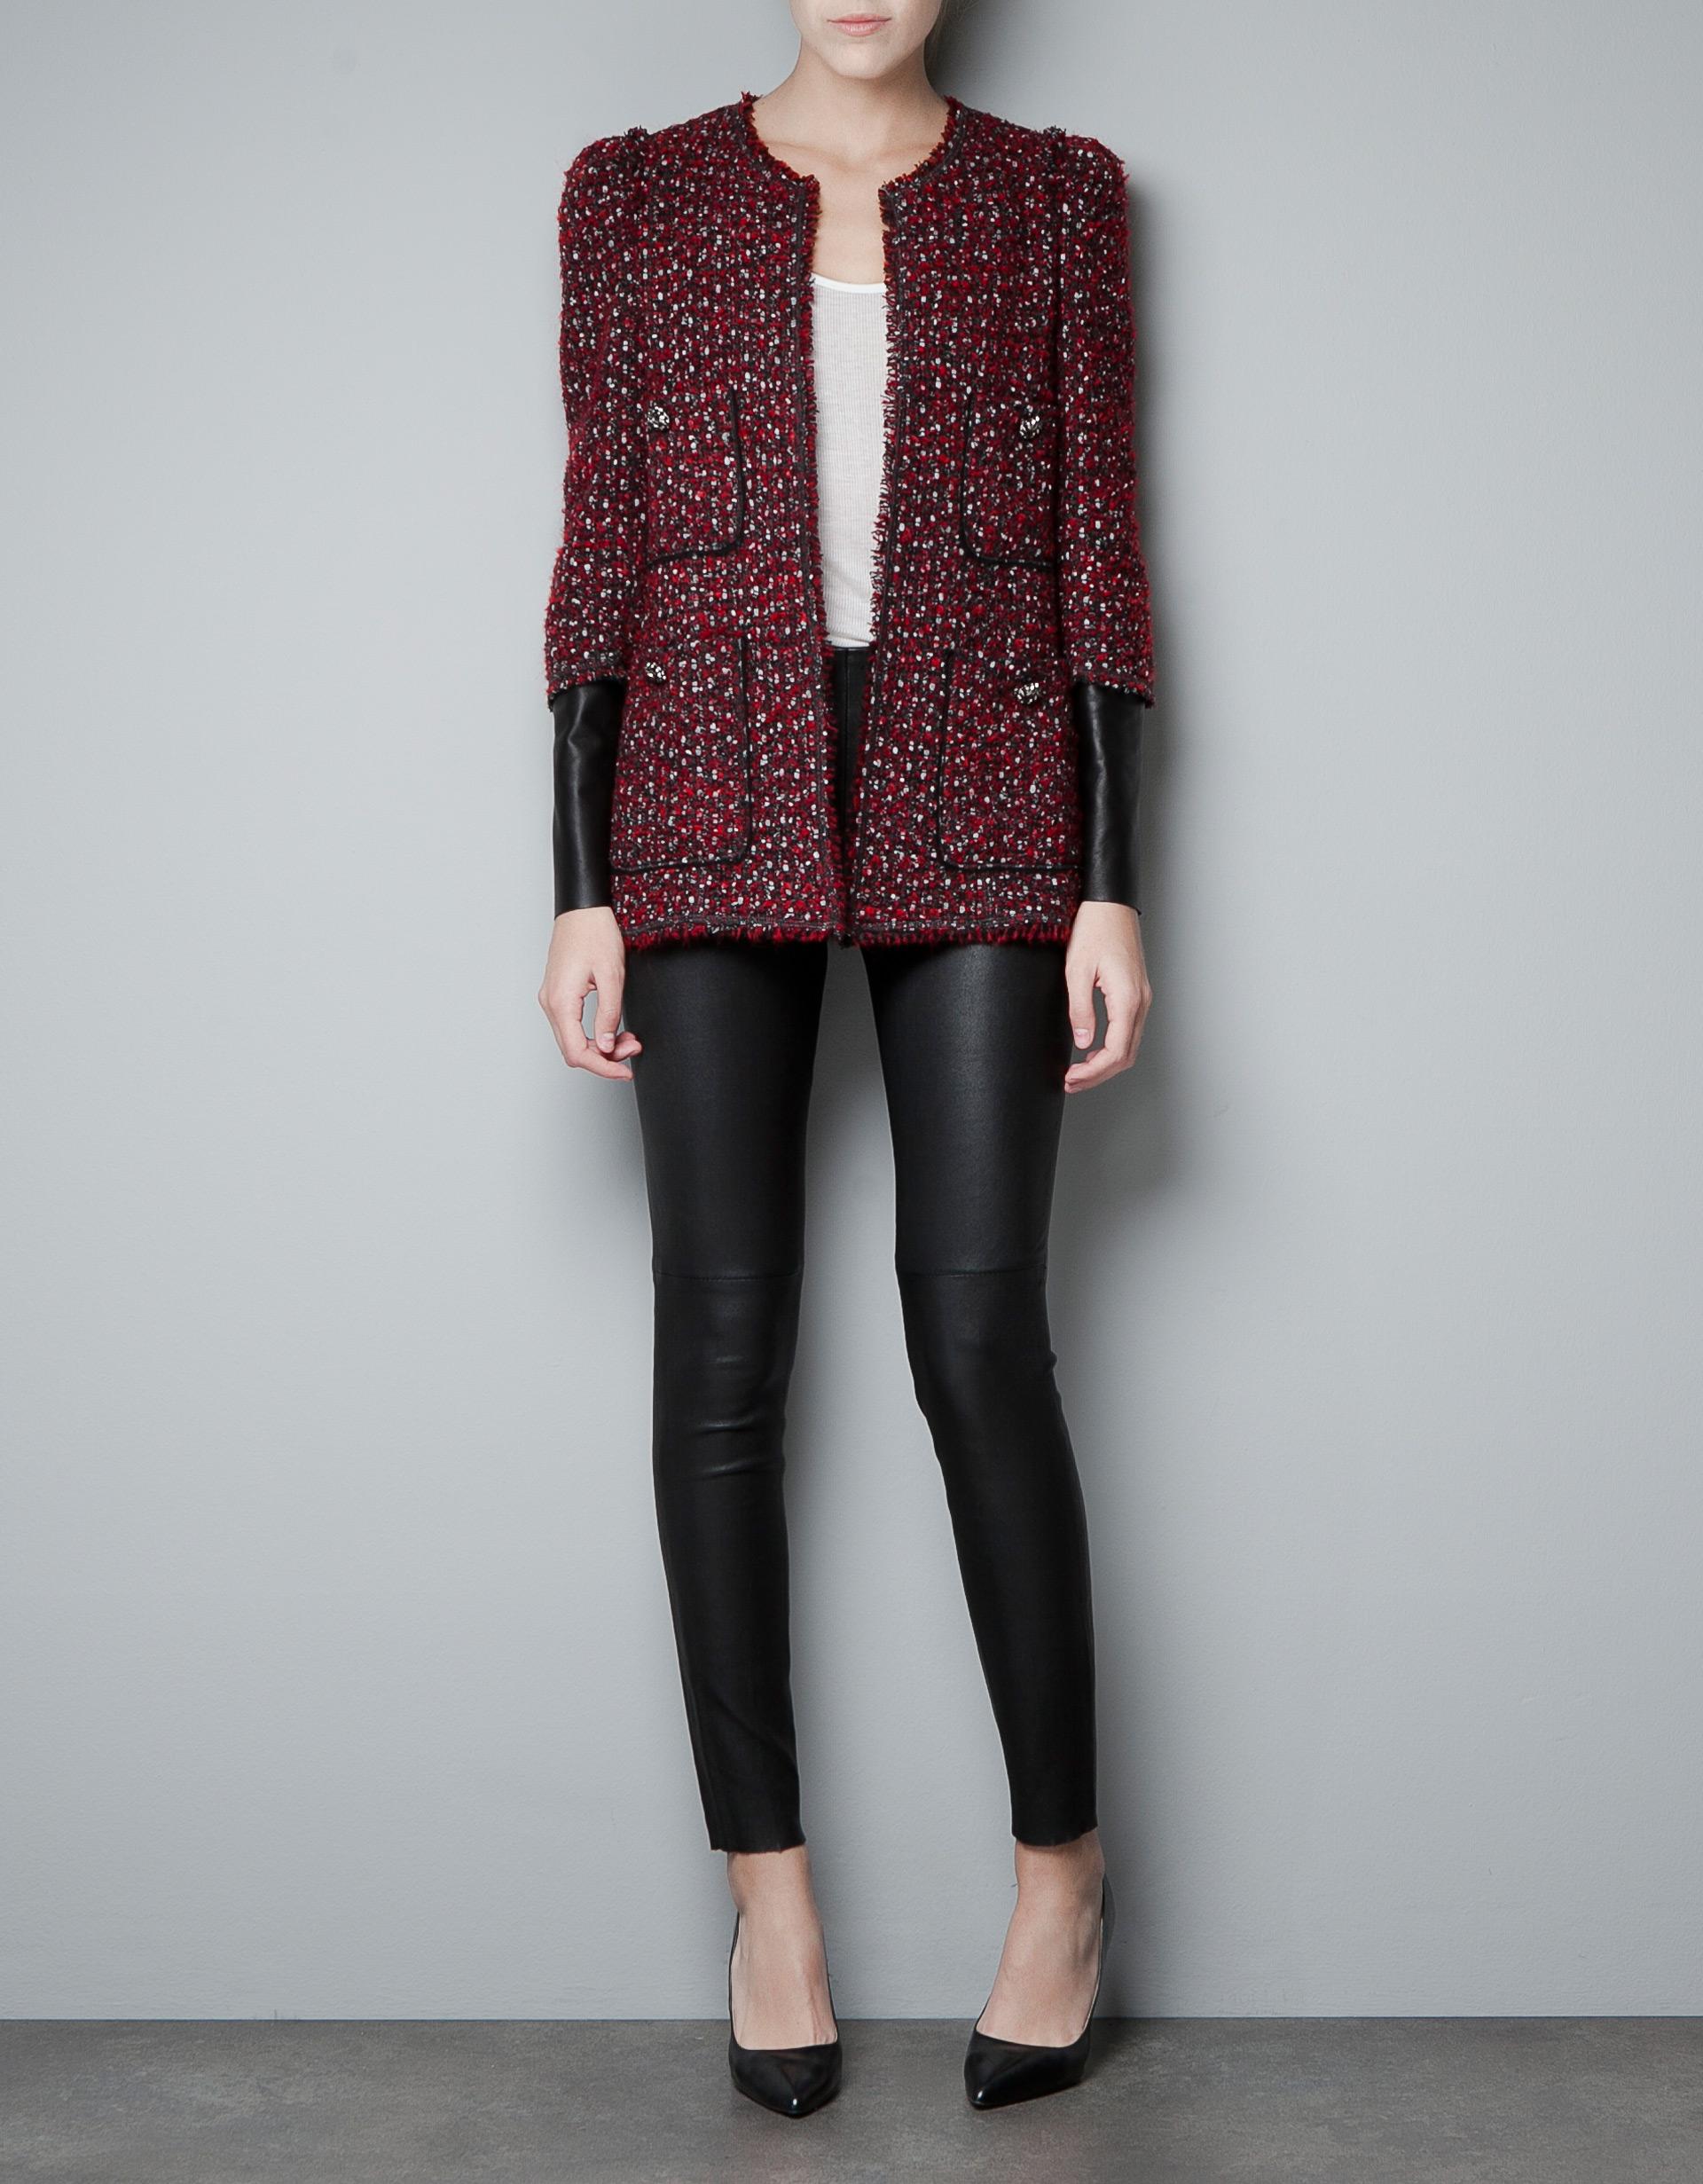 Zara Combined Leather Fantasy Blazer in Red | Lyst